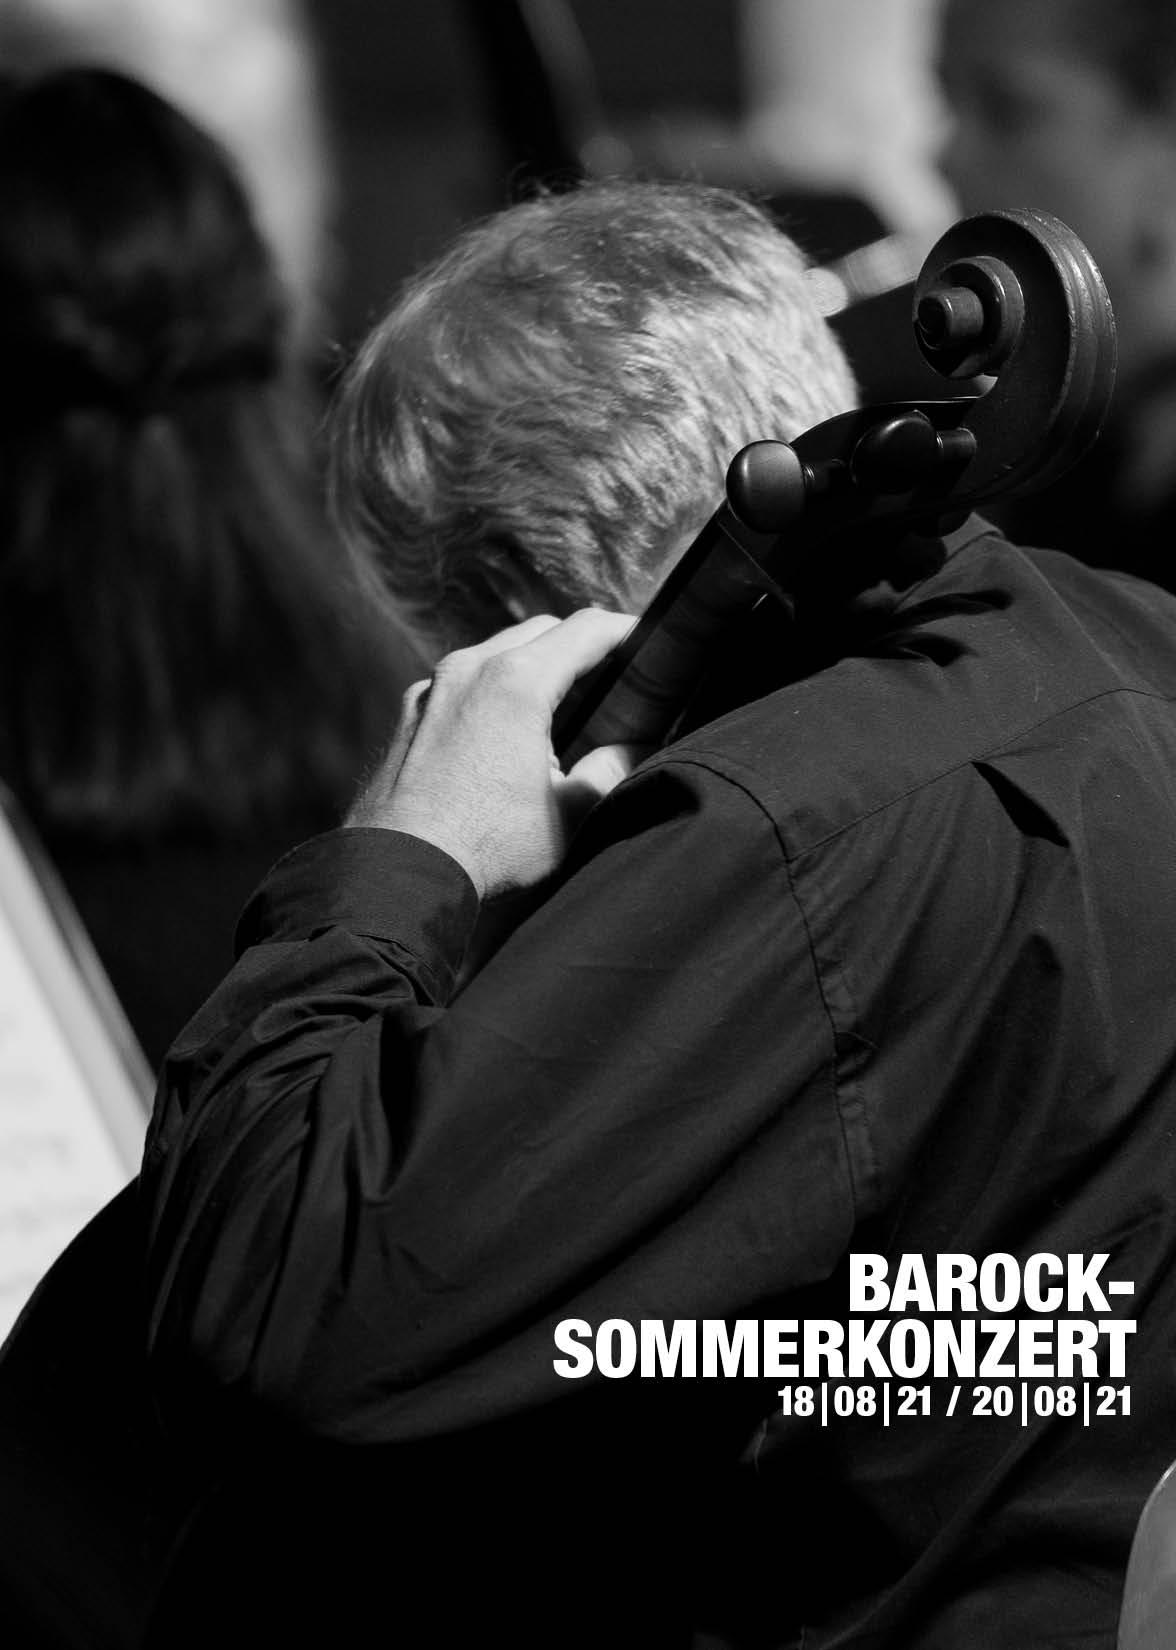 Barock-Sommerkonzert